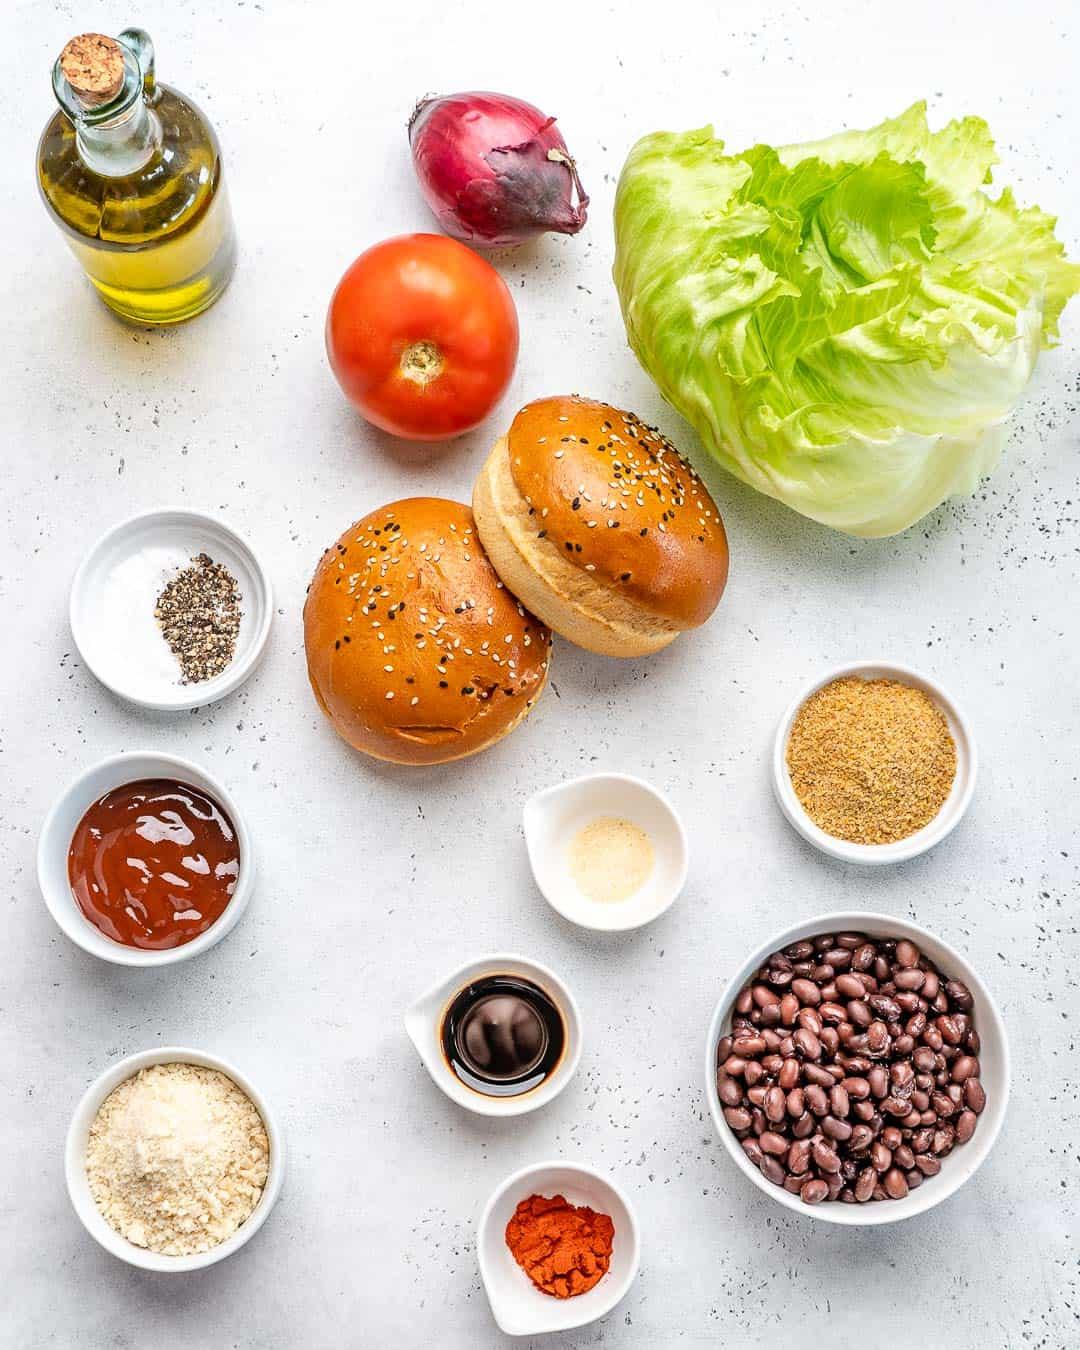 ingredients for Vegan Black Bean Burgers